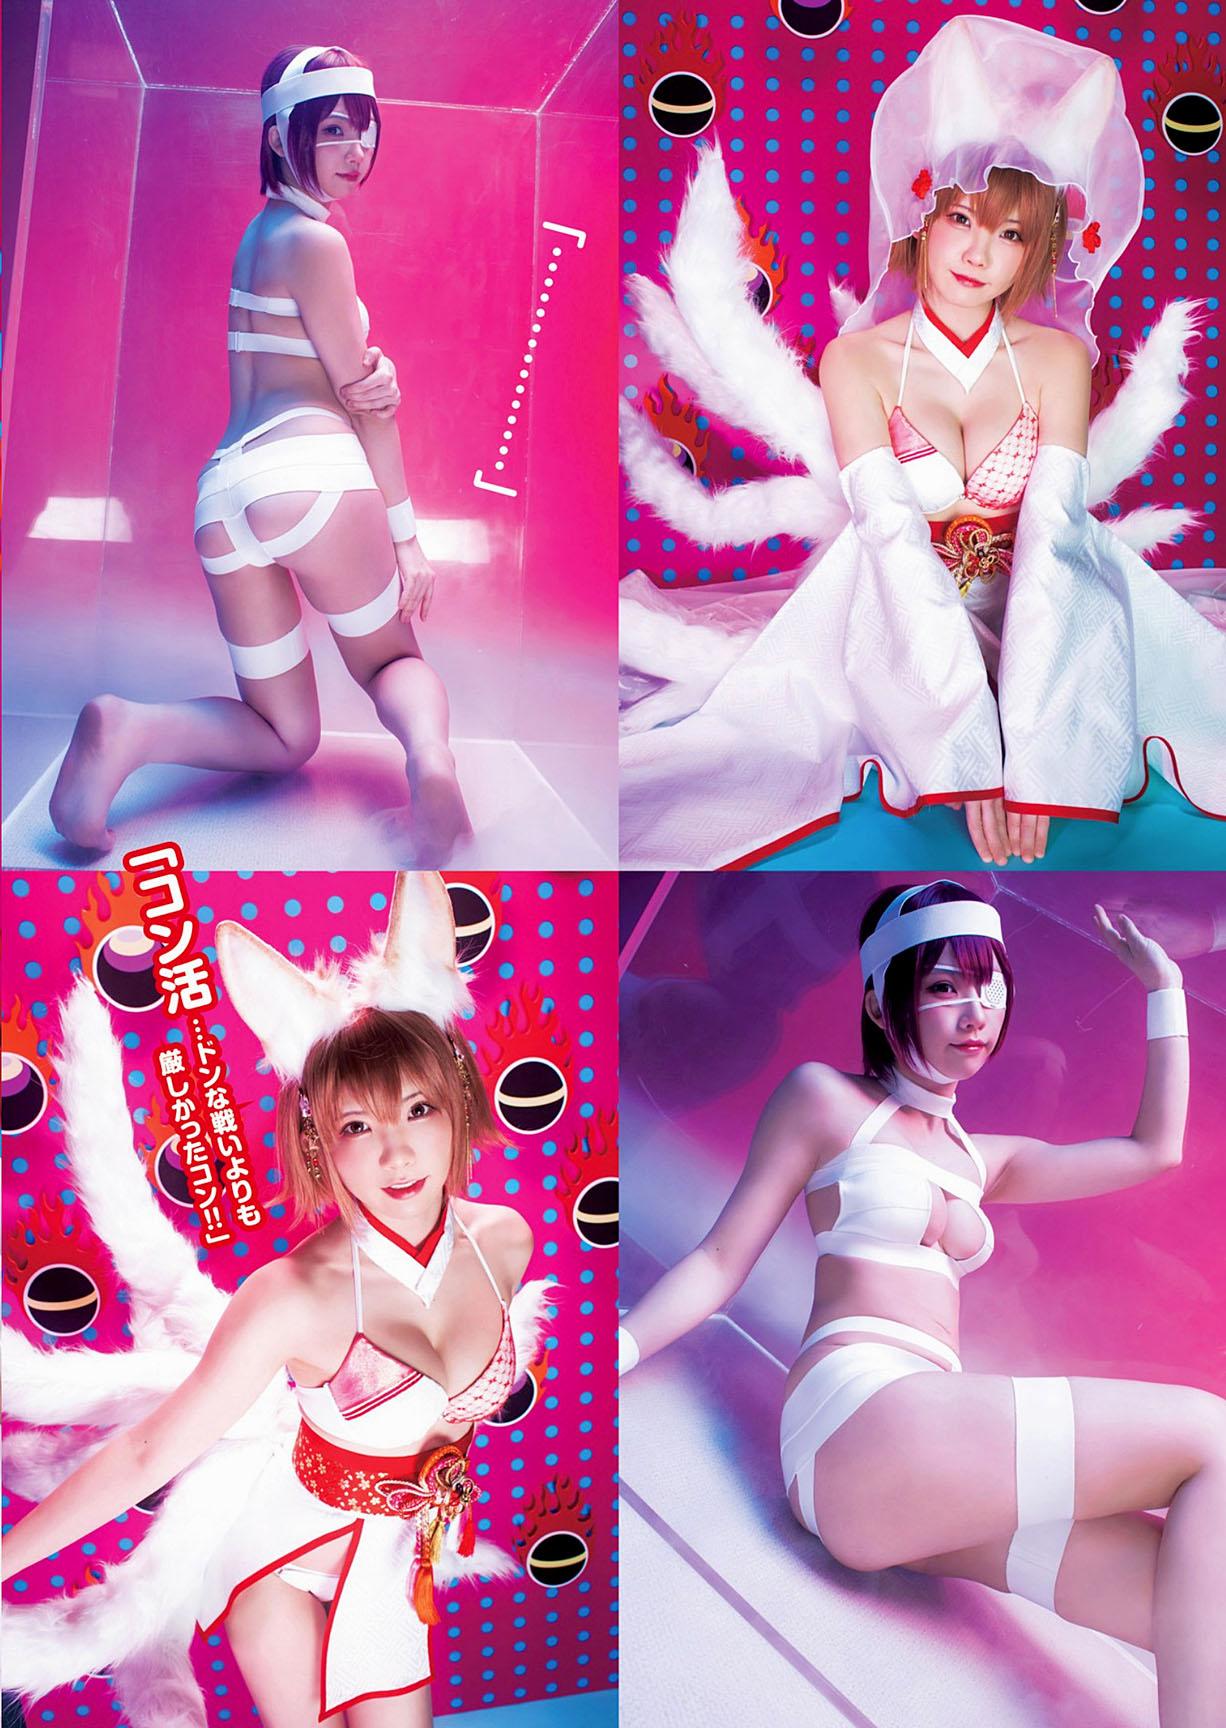 Enako Young Jump 210325 05.jpg